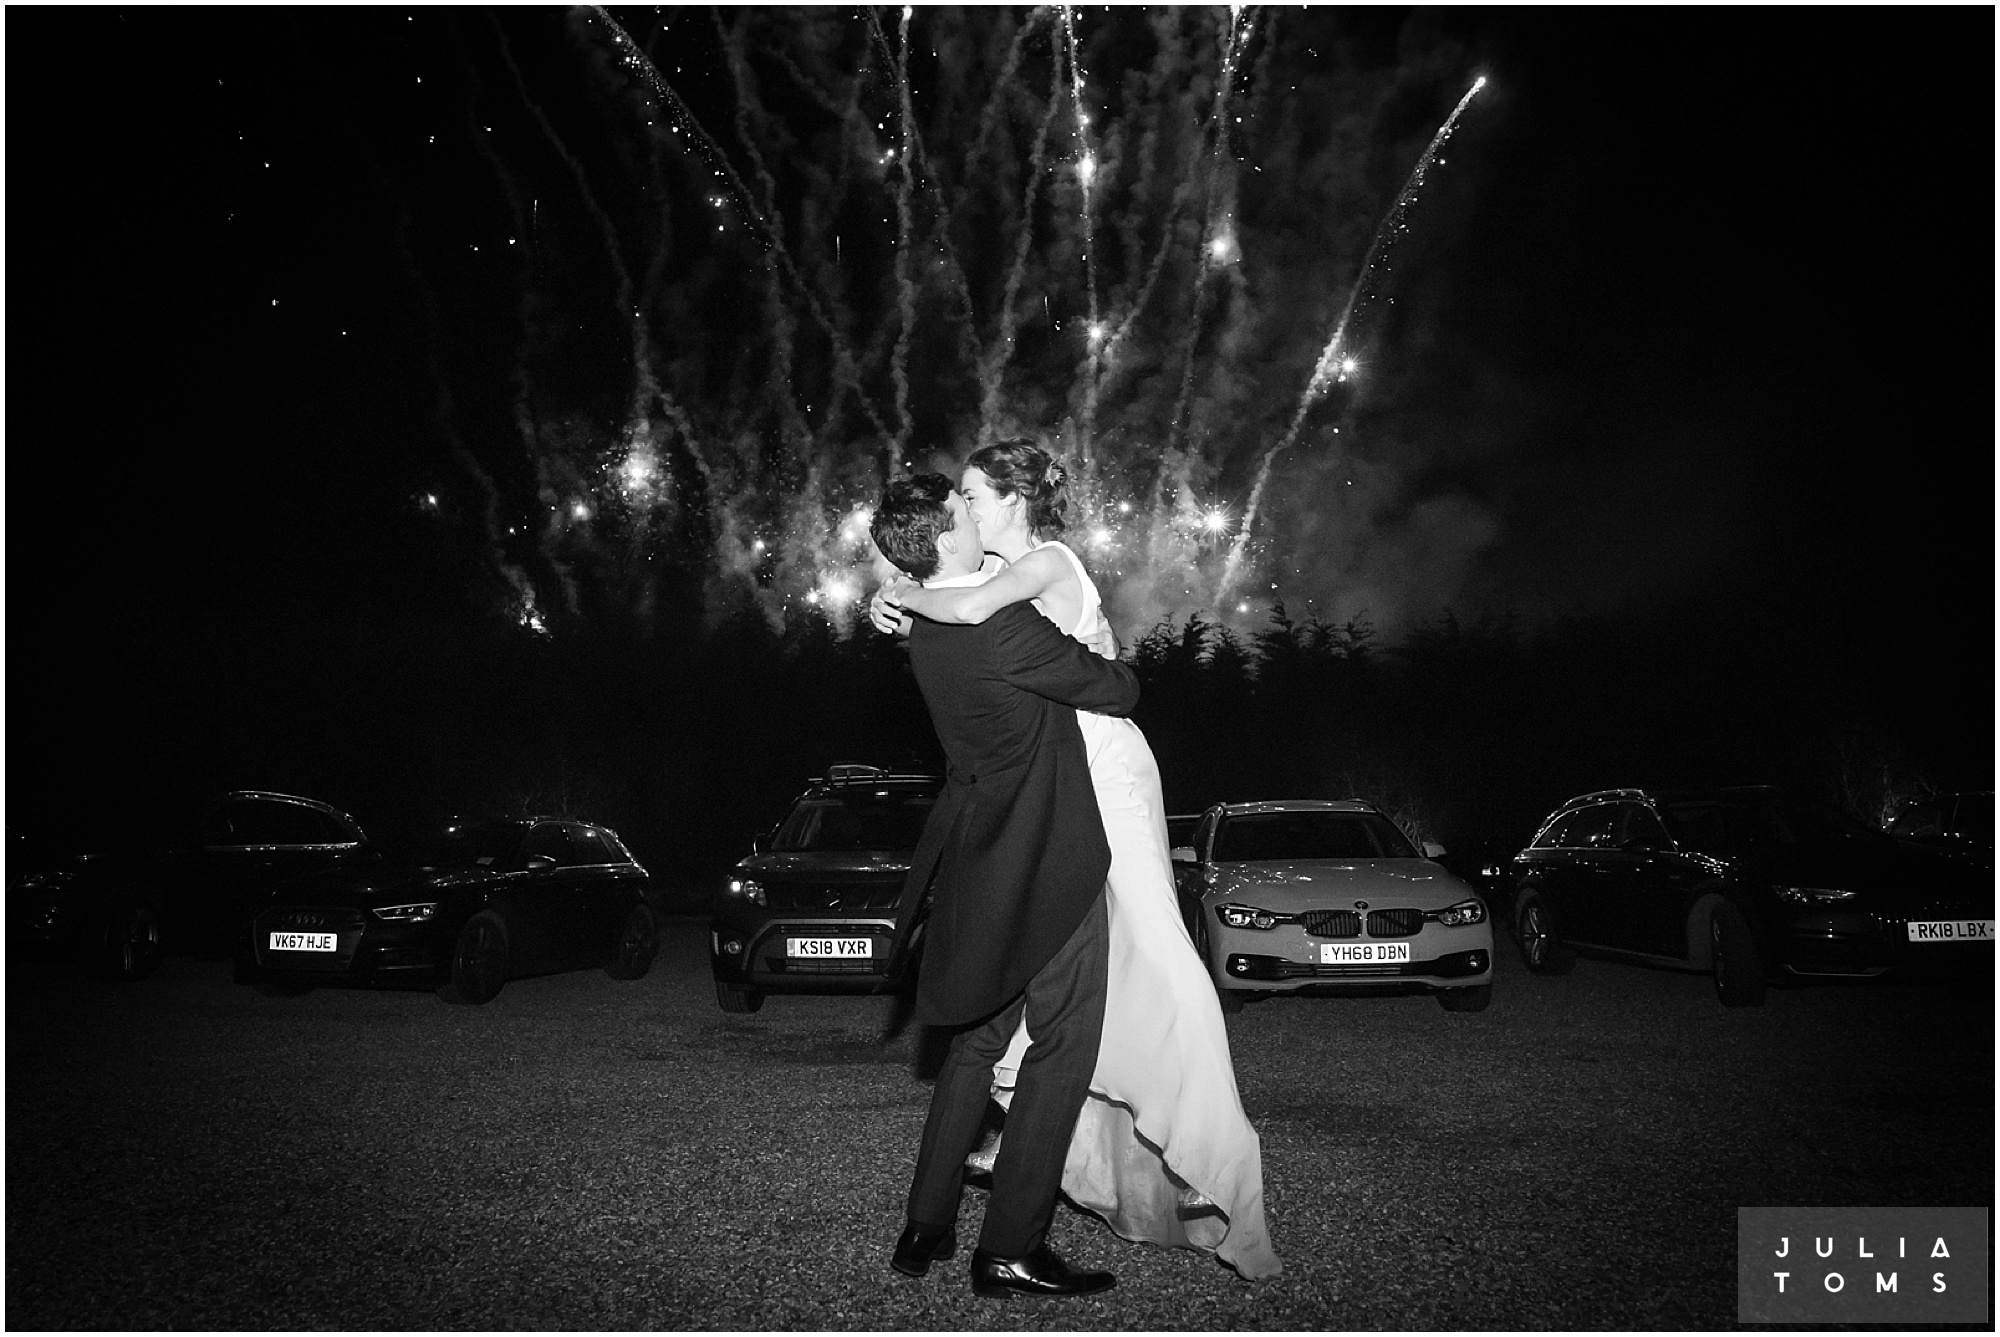 Southend_barn_wedding_photographer_juliatoms_022.jpg